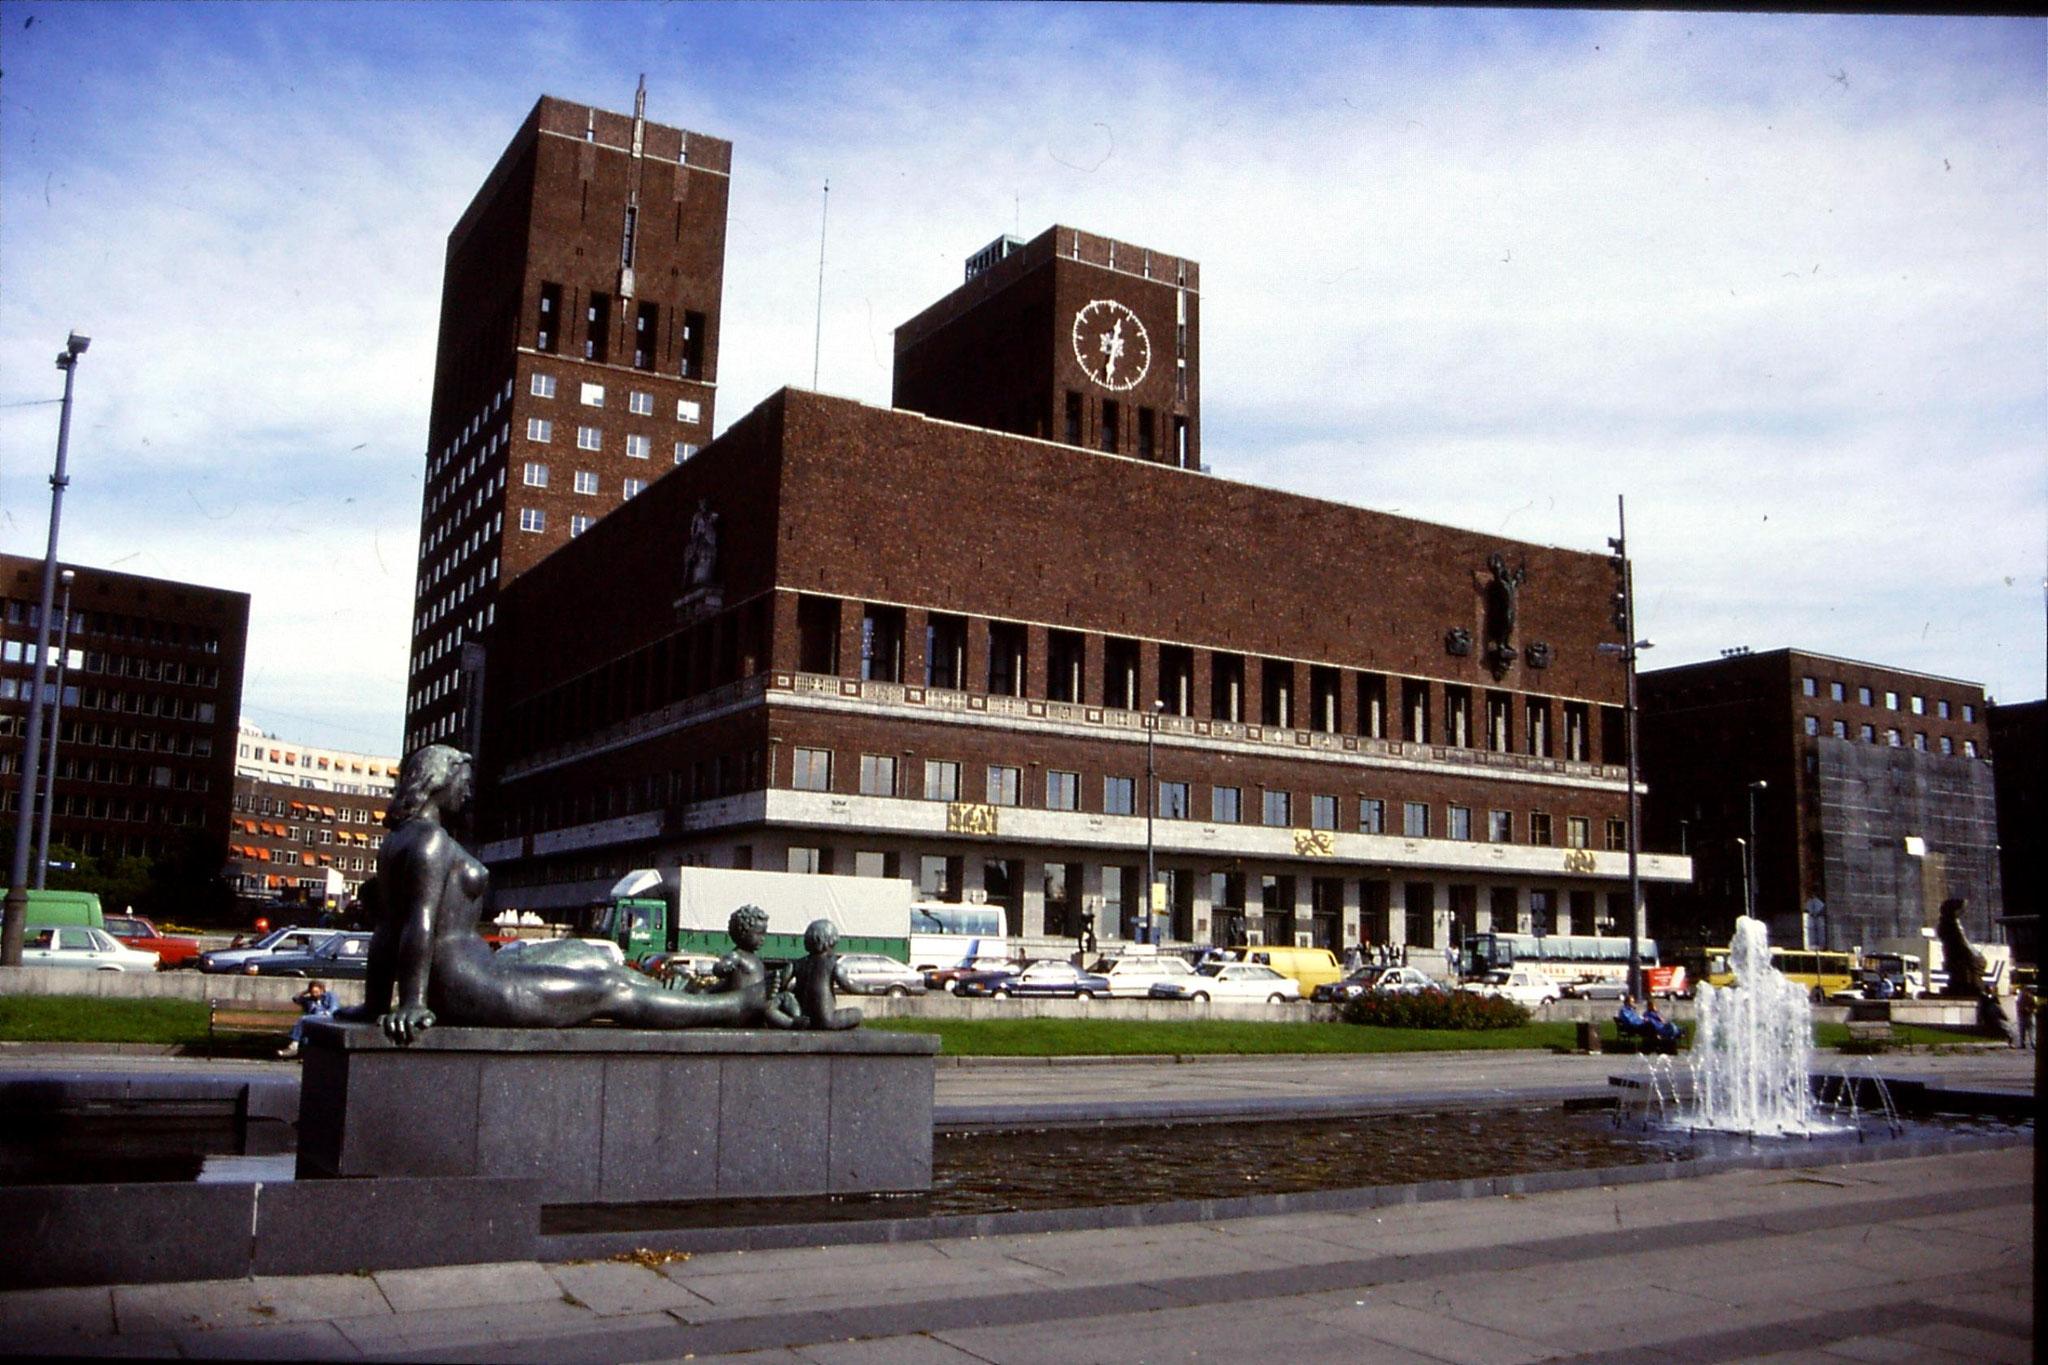 16/9/1988: 8: Oslo City Hall